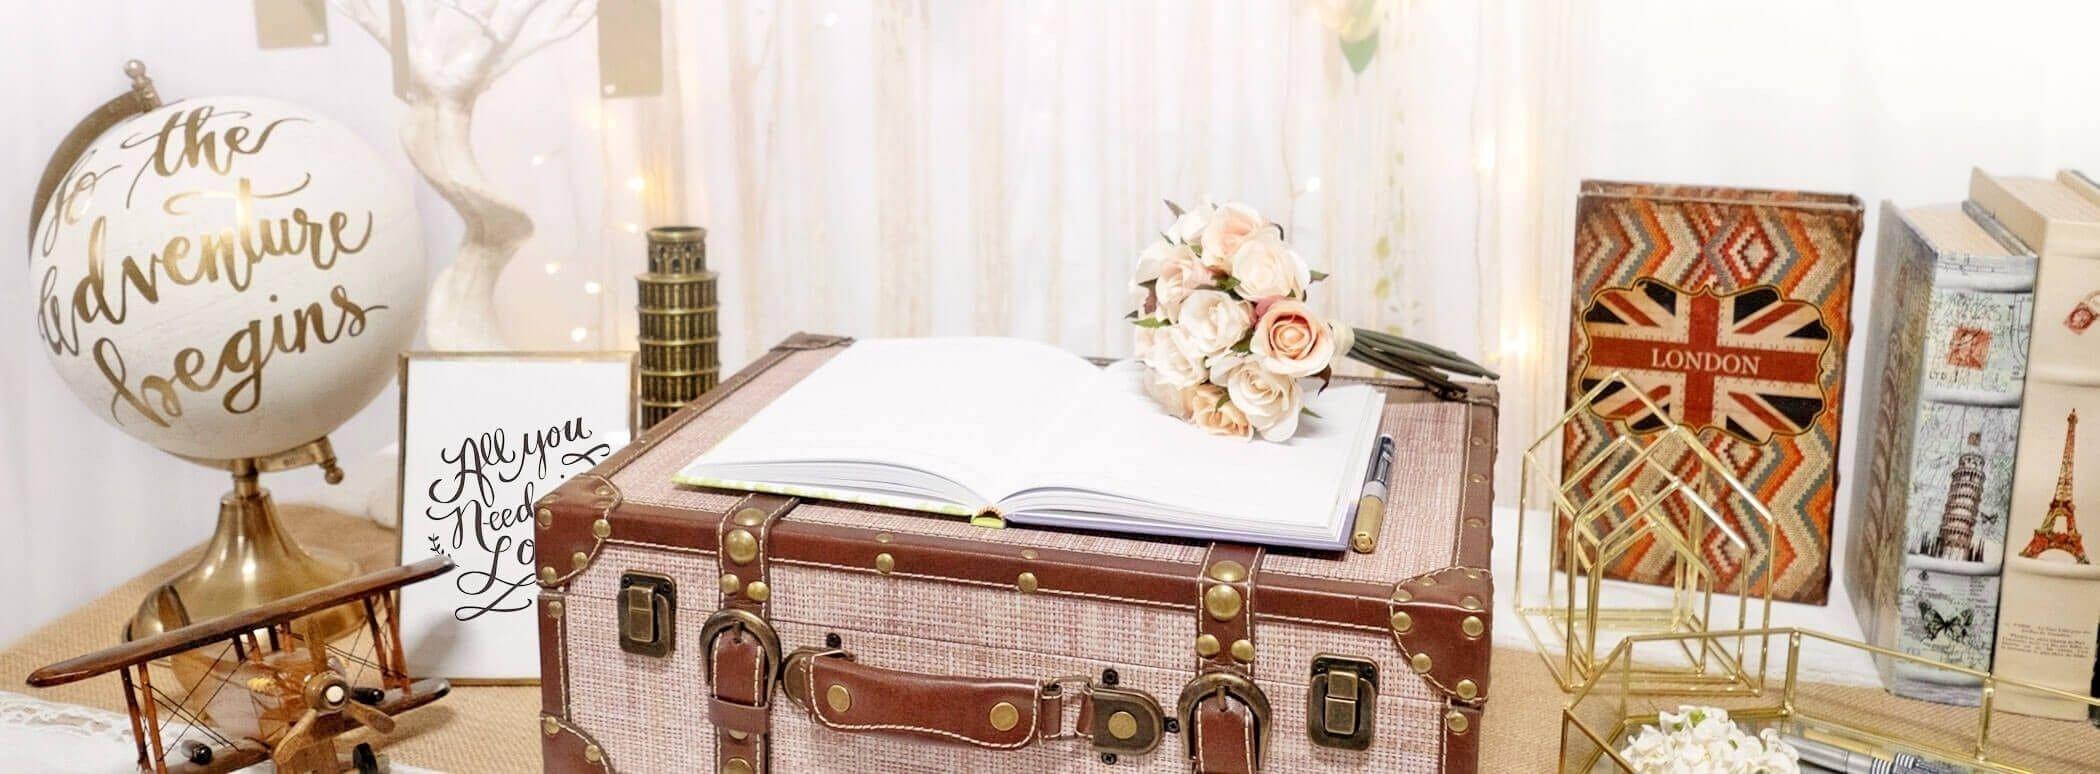 Dreamscaper.sg - Wedding Props Rental & Wedding Decoration in Singapore